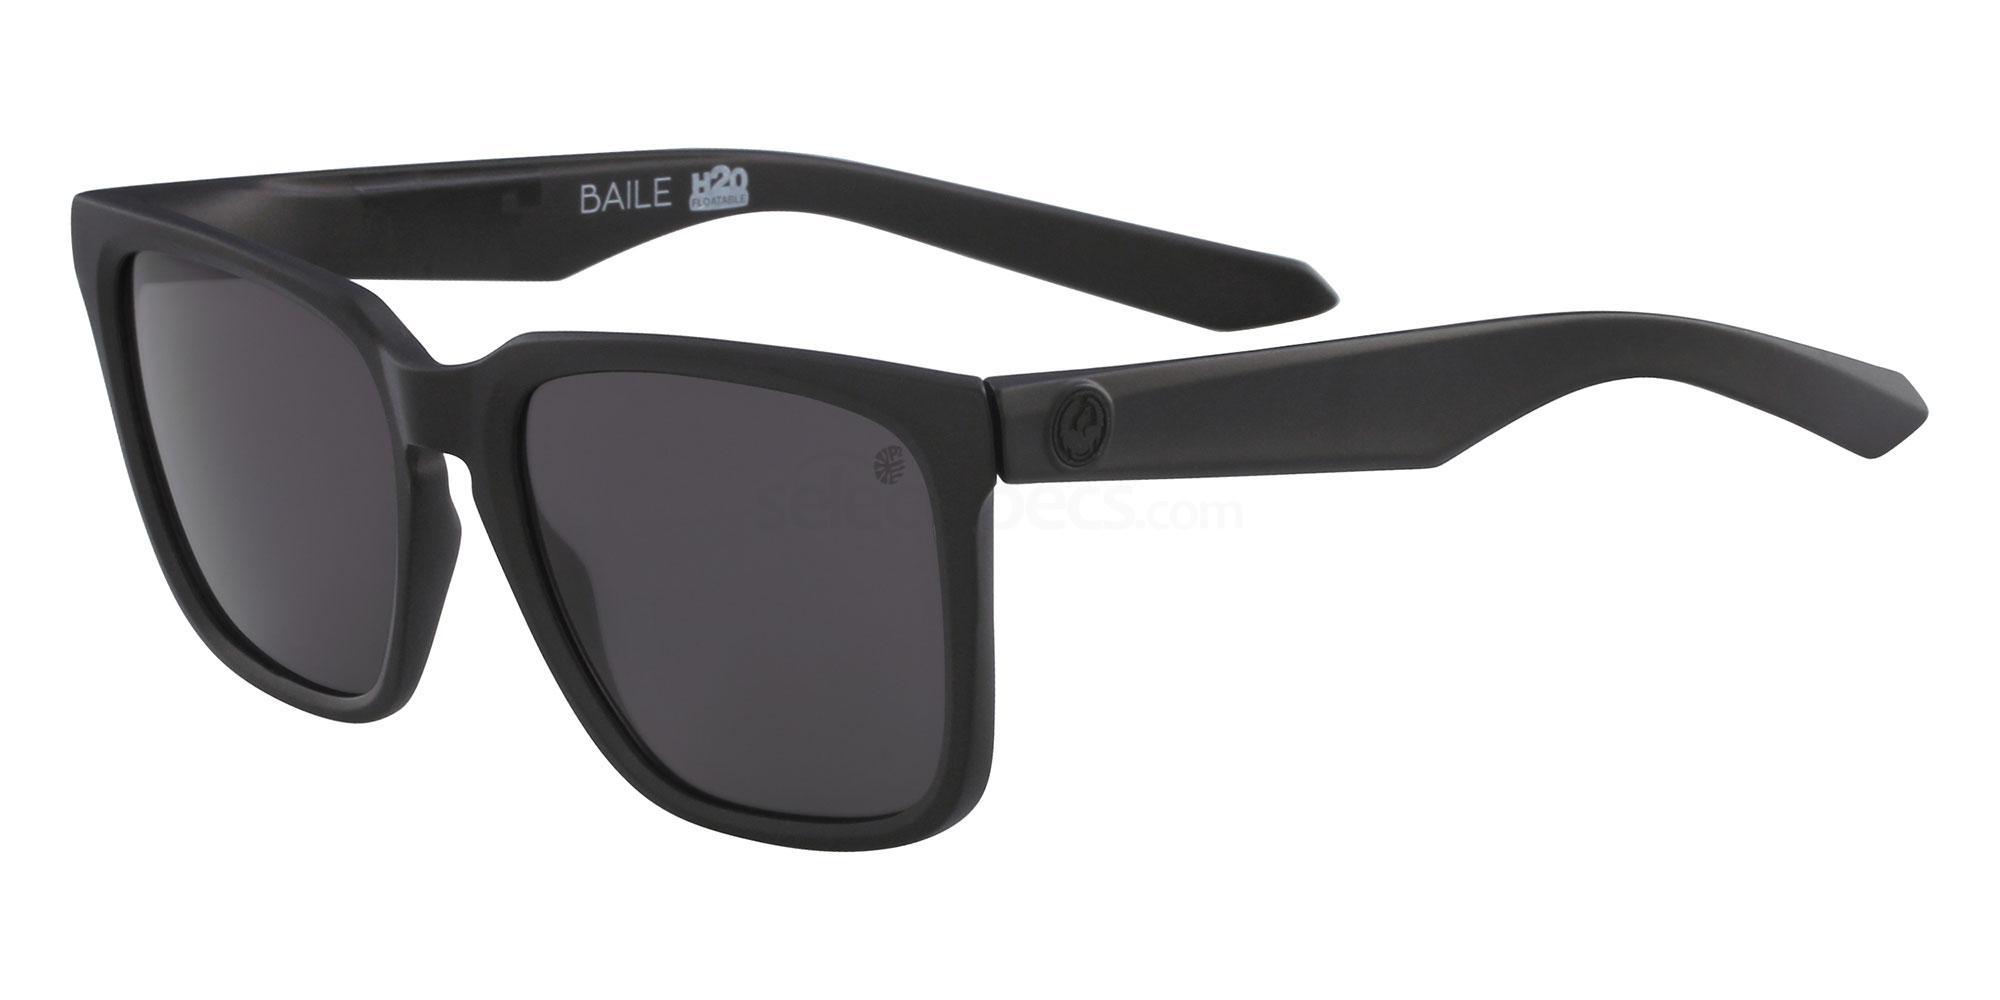 003 DR BAILE LL H2O Sunglasses, Dragon